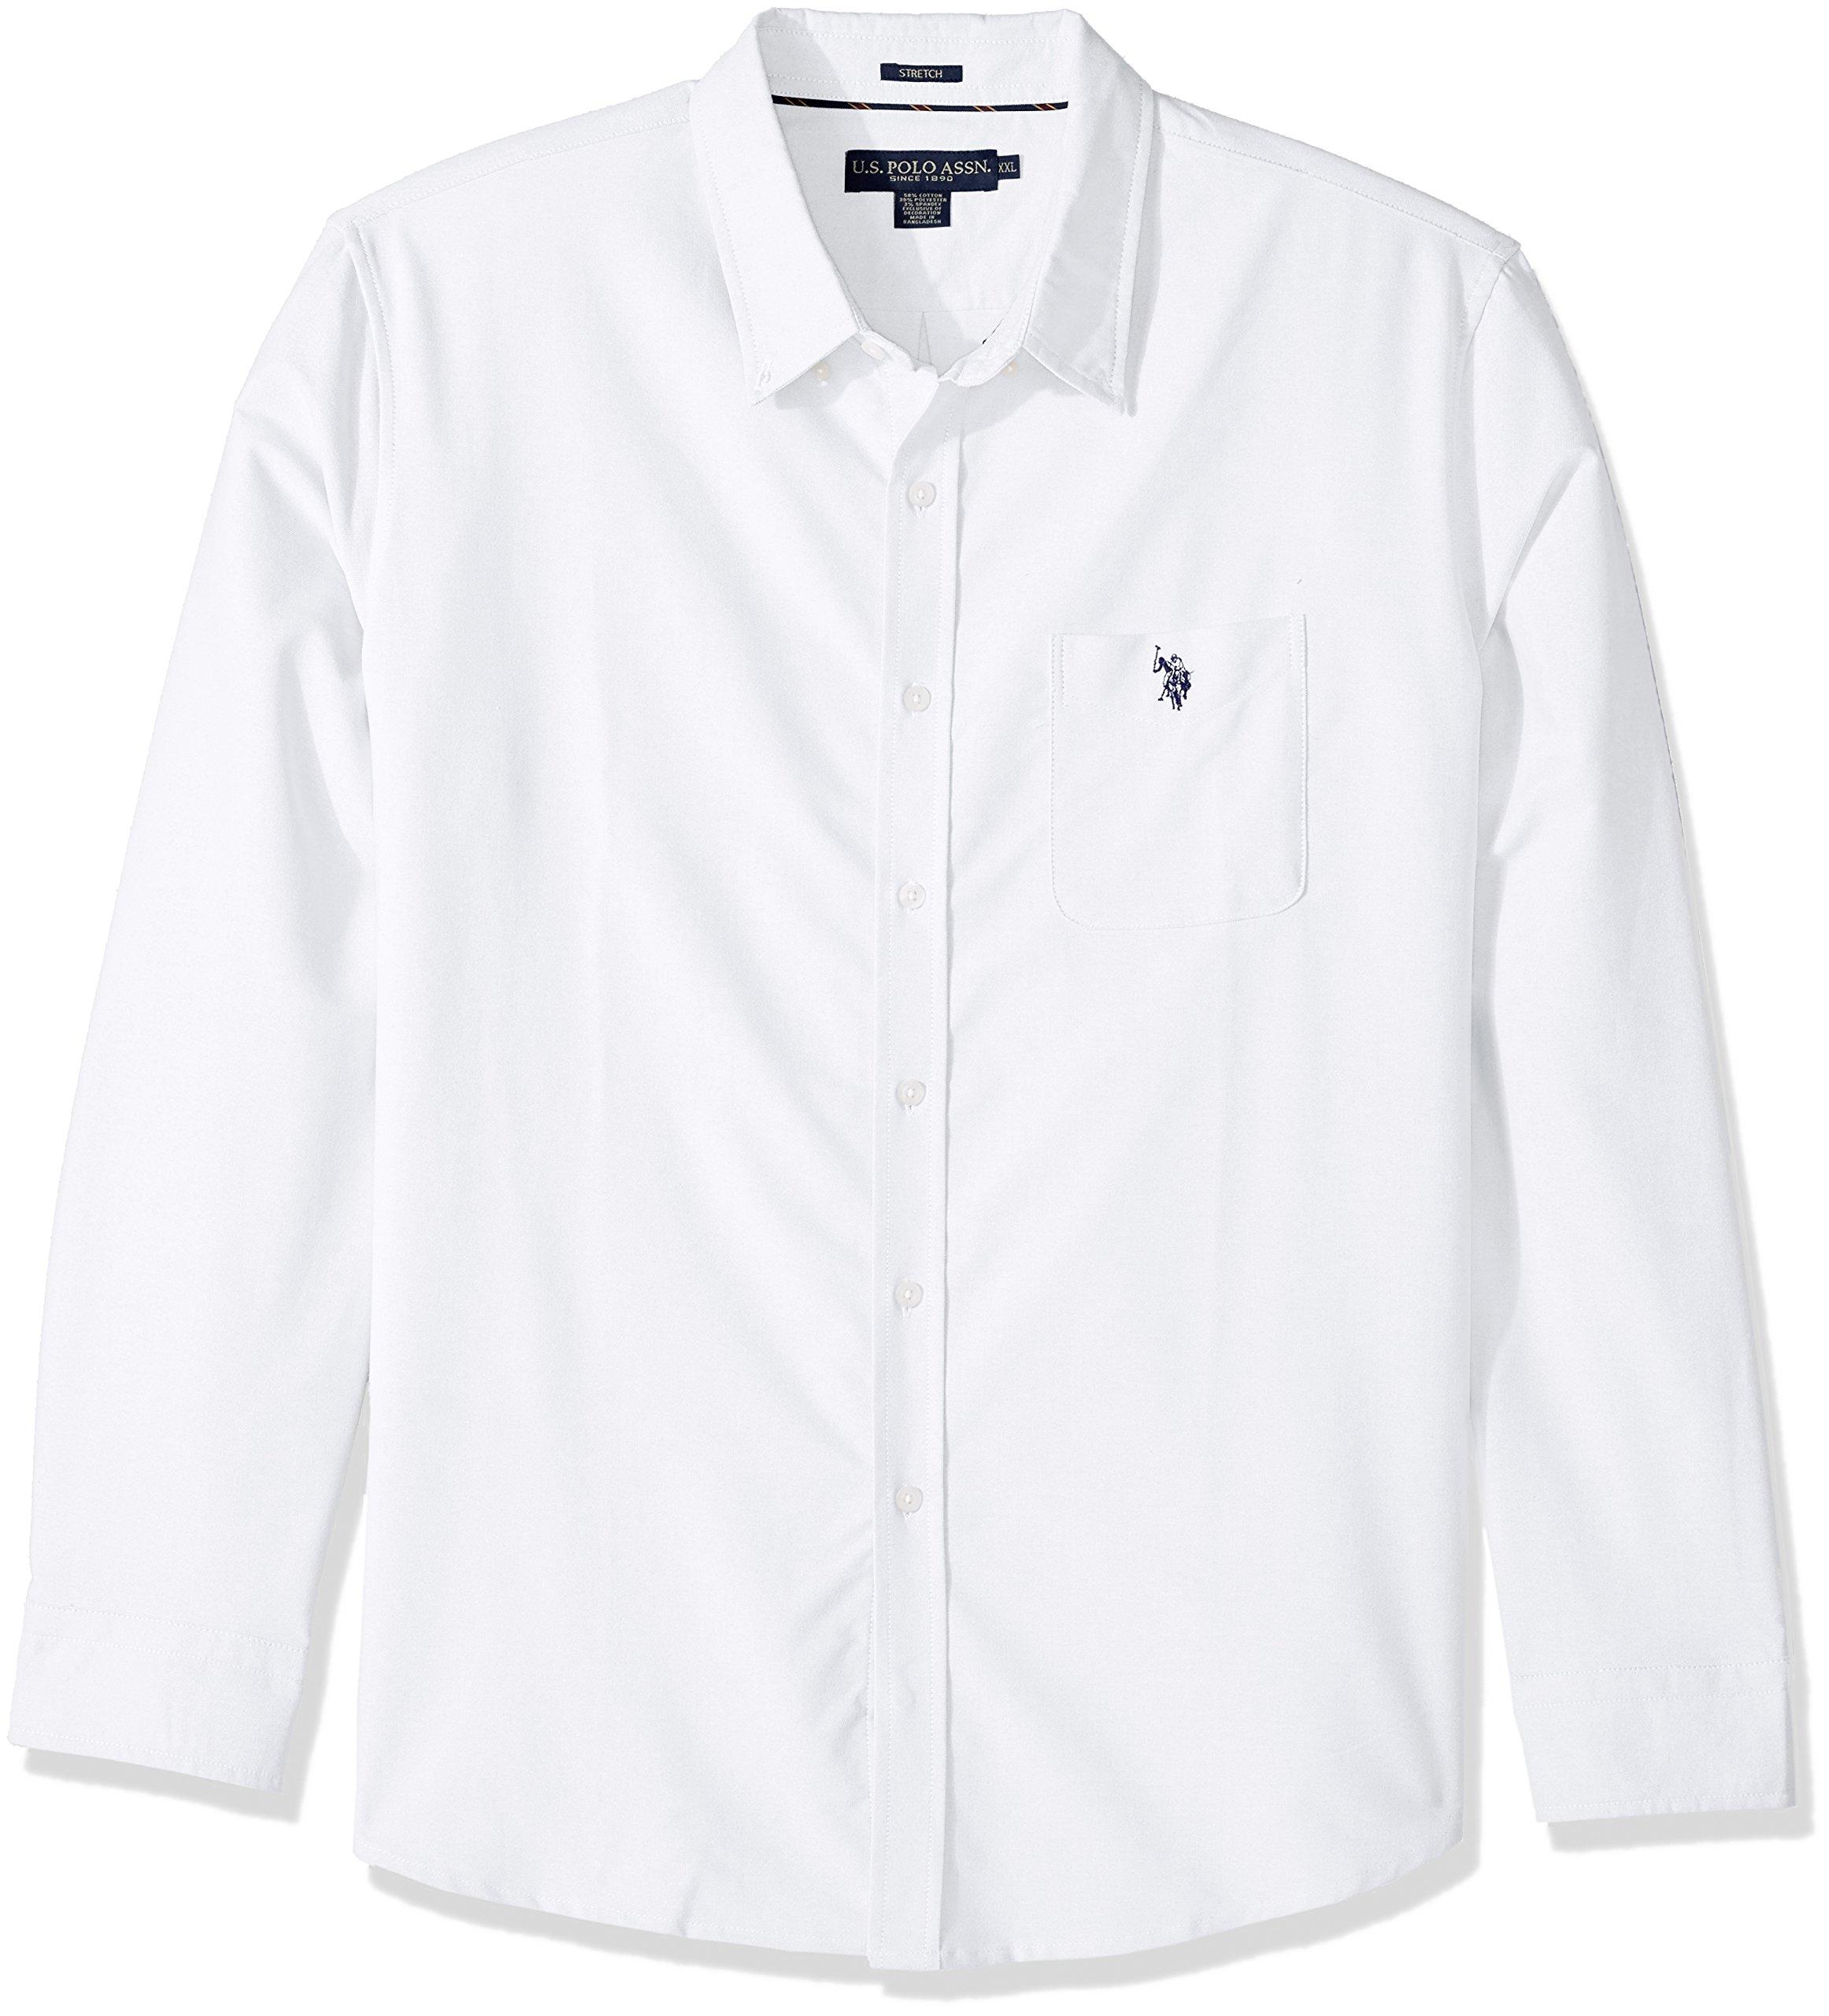 Polo Assn Mens Long Sleeve Classic Fit Woven Shirt U.S